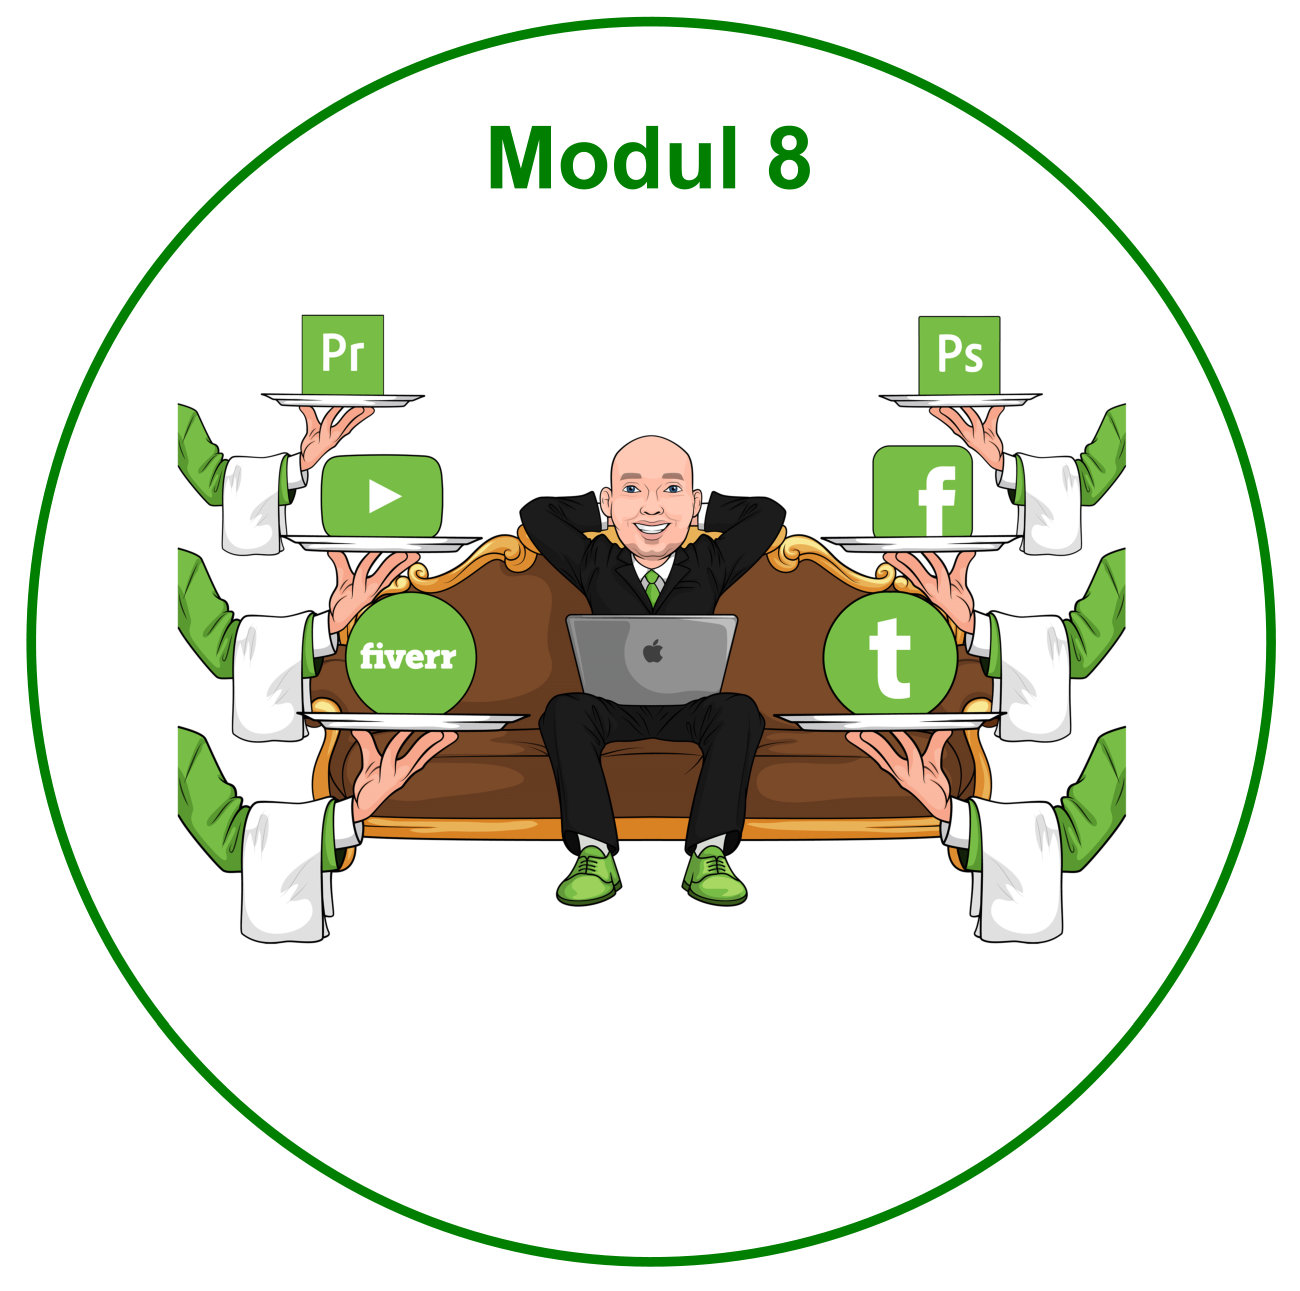 Modul 8 - Crashkurs für Internetunternehmer